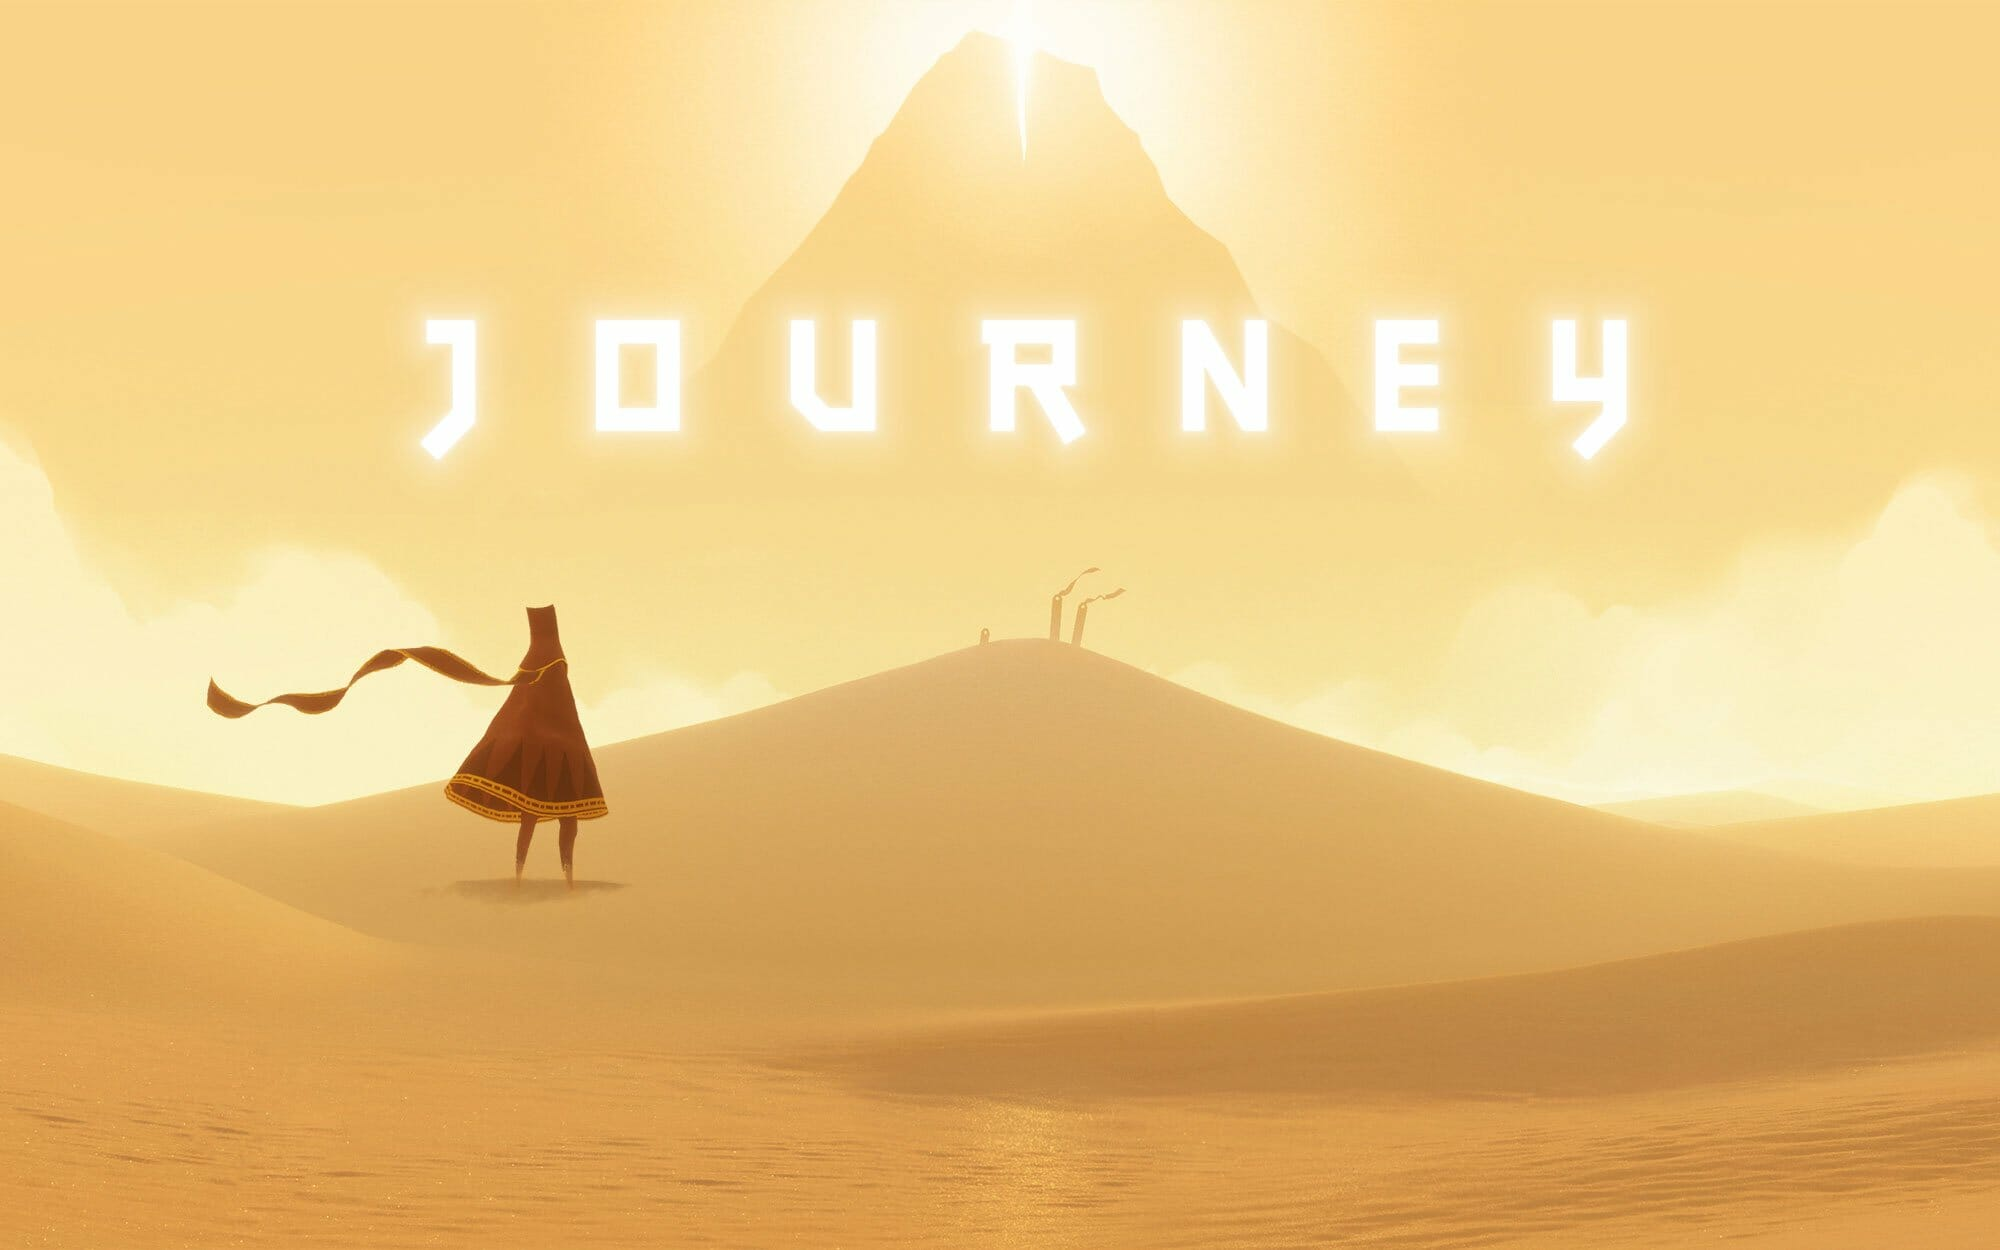 Ödüllü PlayStation oyunu 'Journey' iOS'ta mevcut 1